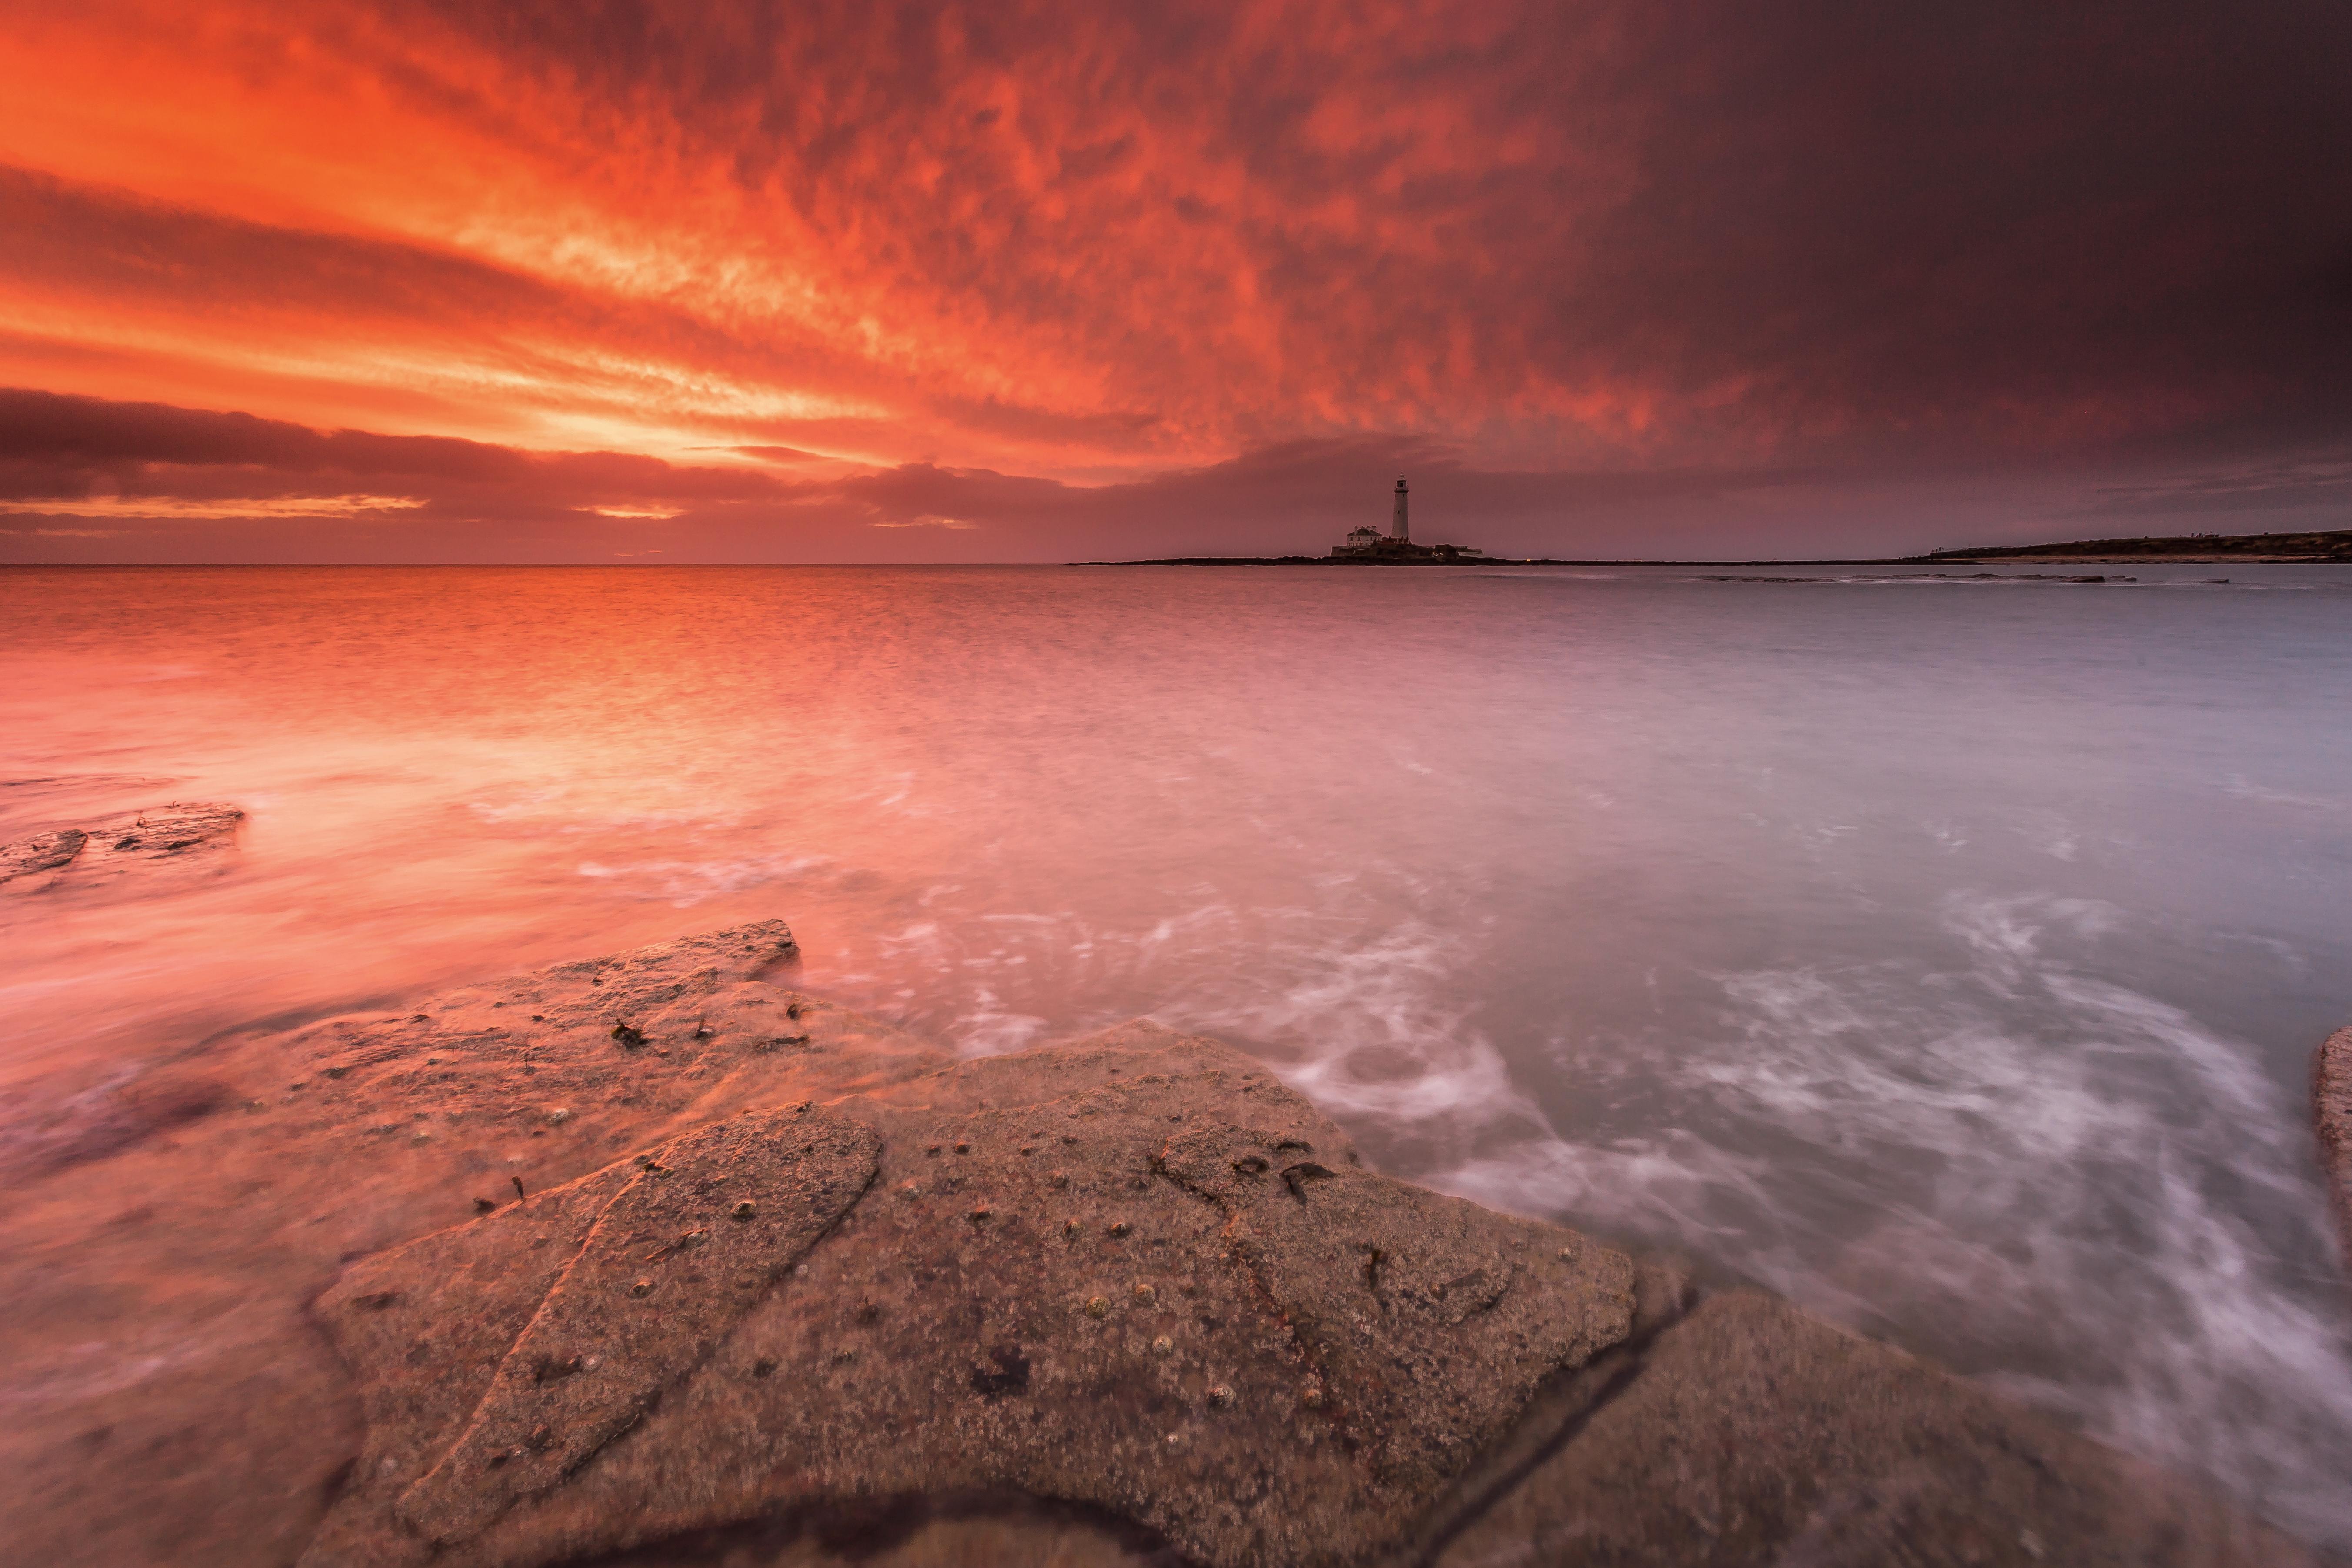 Wallpaper Tua Matahari Terbenam Teluk Air Pantai Matahari